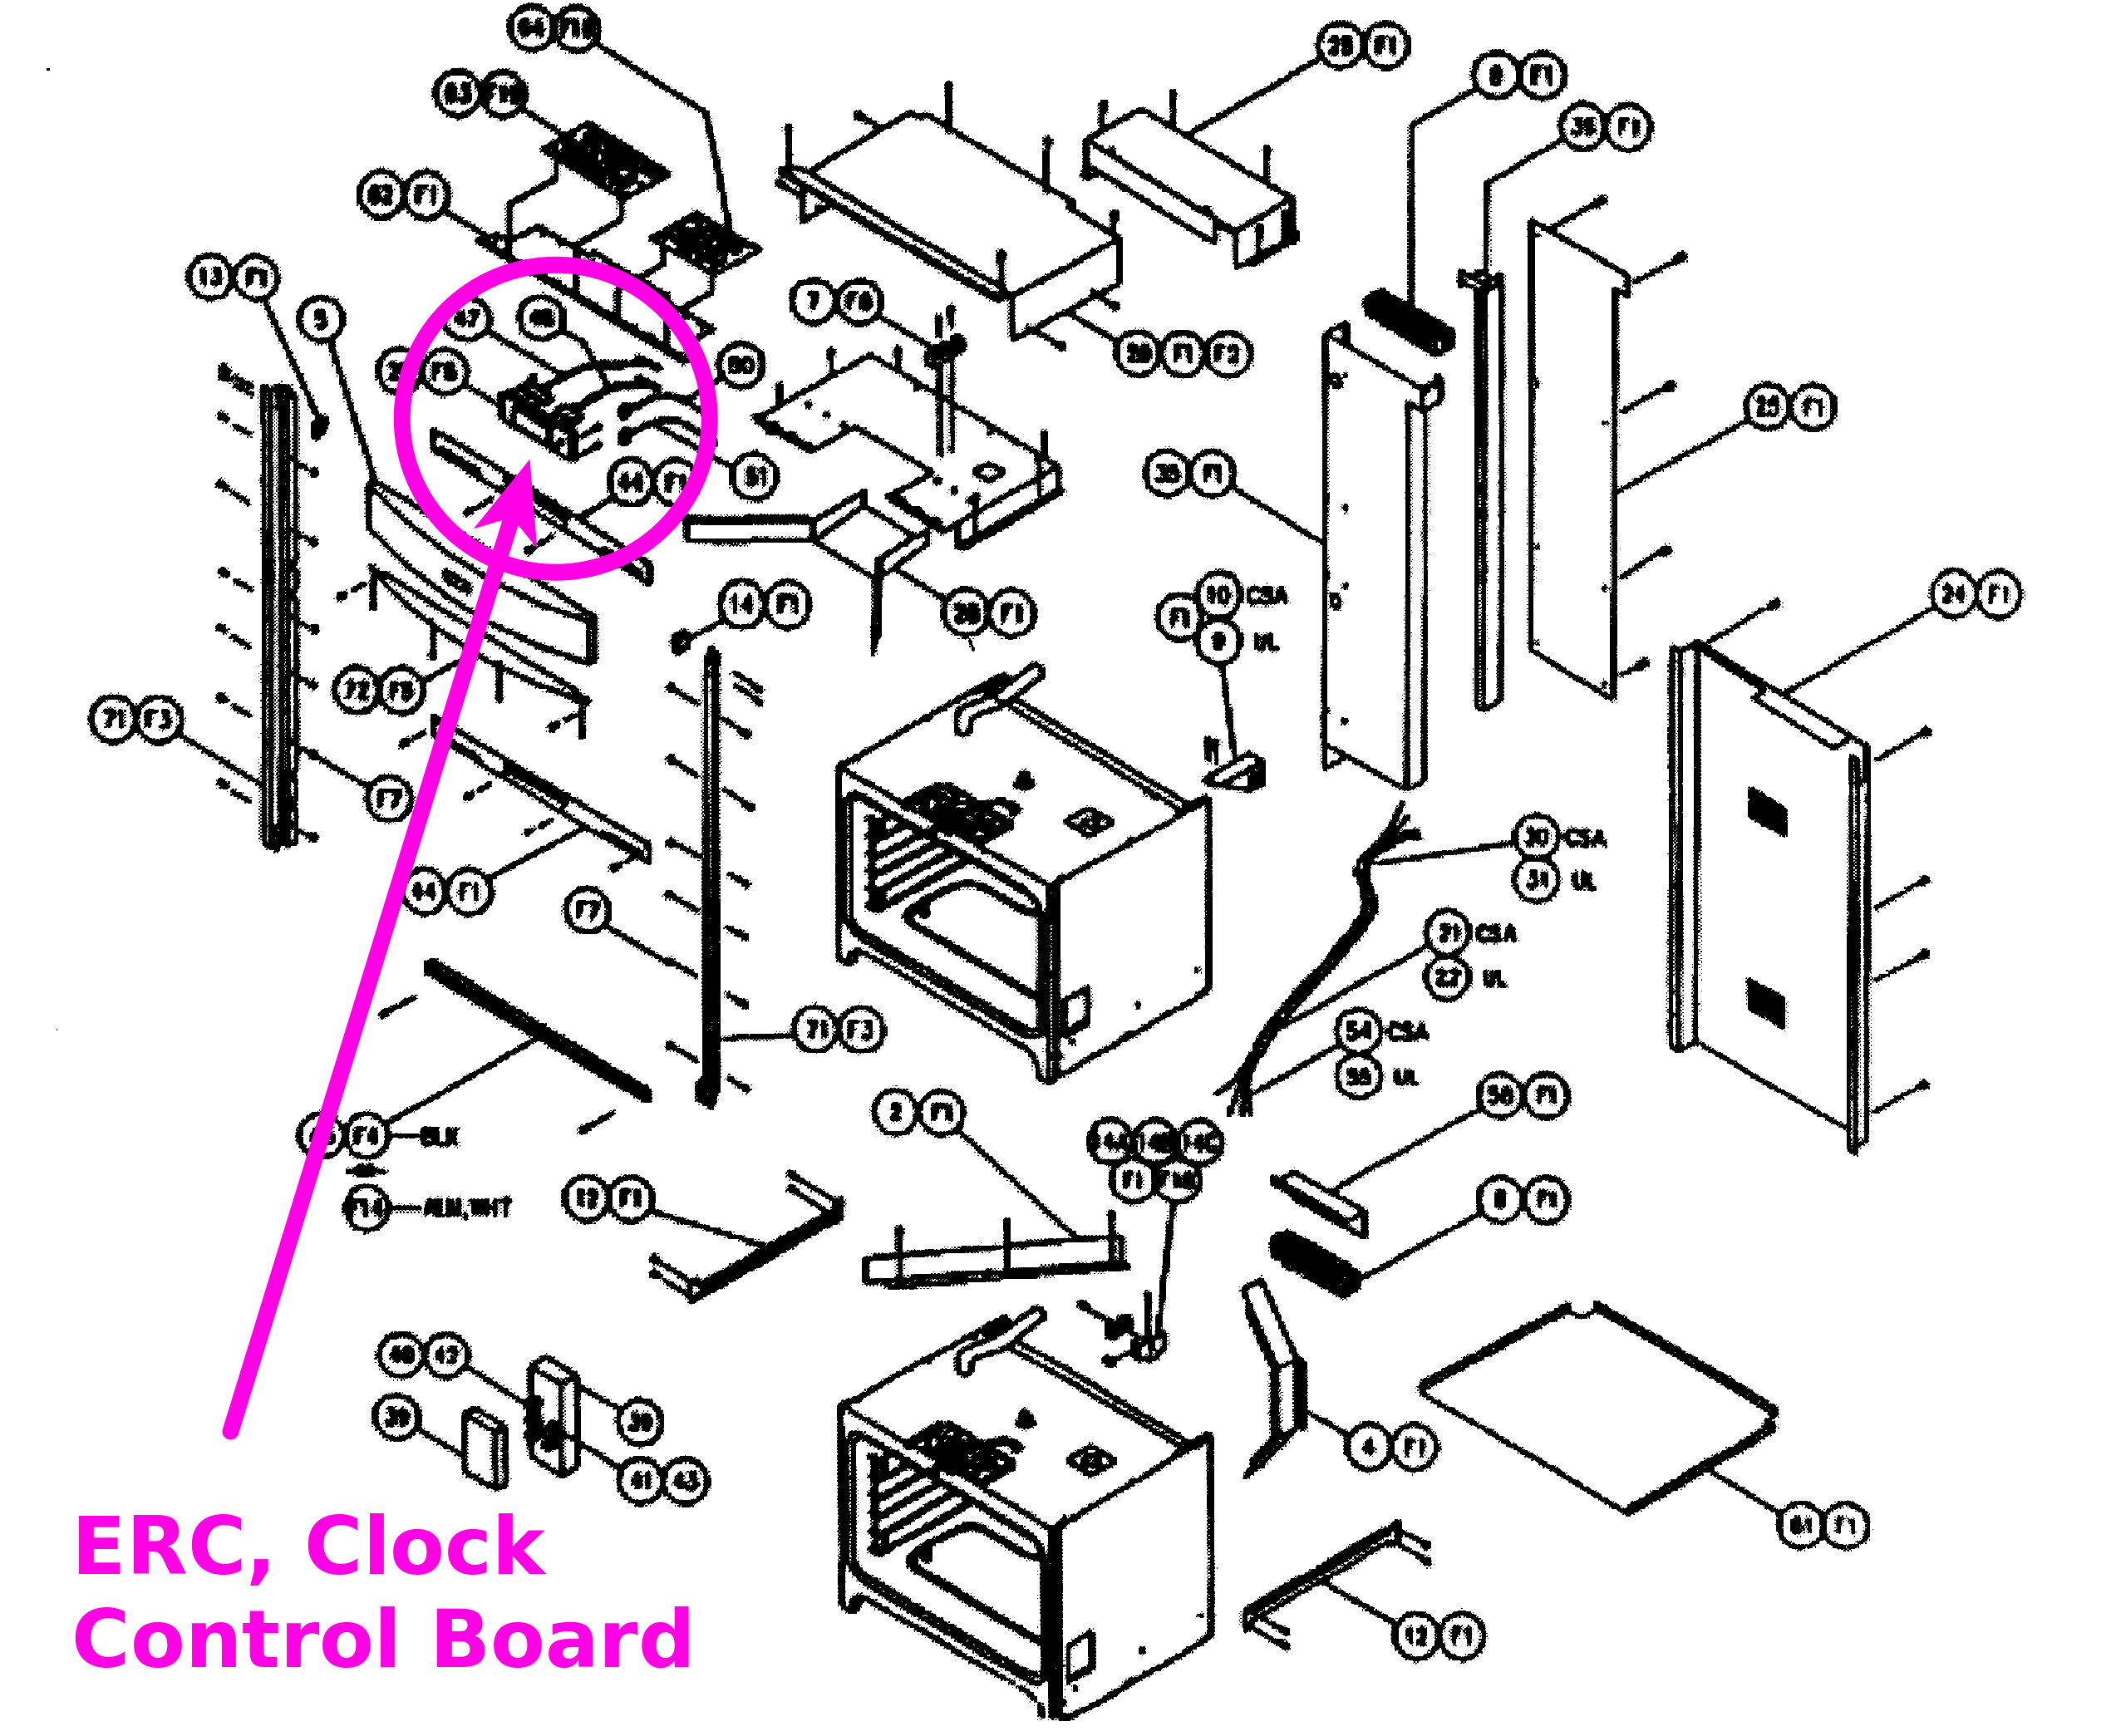 hs_8445] dacor wall oven wiring diagram wiring diagram  hist unbe umize hyedi mohammedshrine librar wiring 101